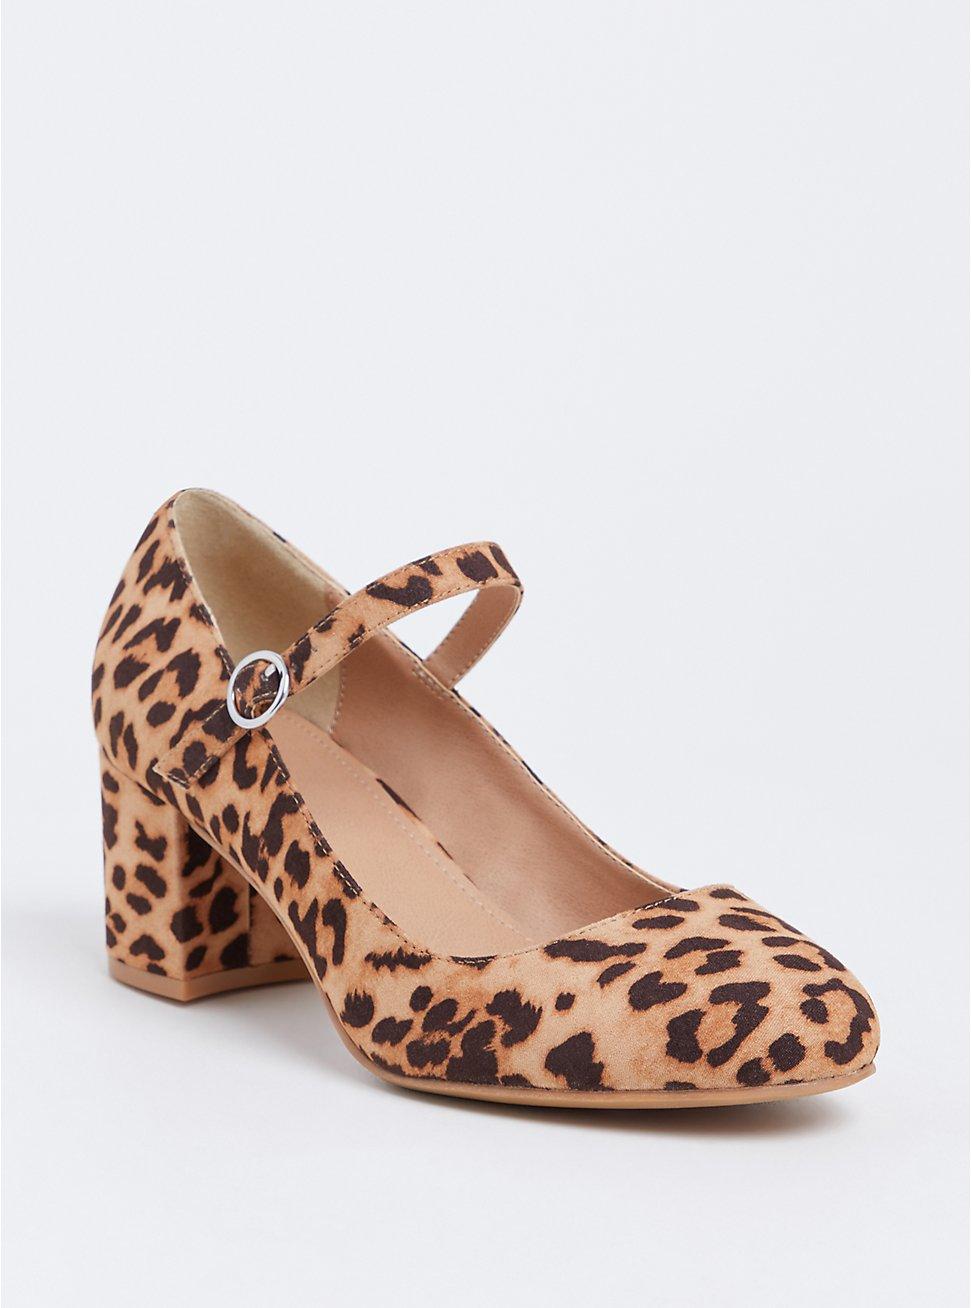 Leopard Mary Jane Pump (Wide Width), ANIMAL, hi-res